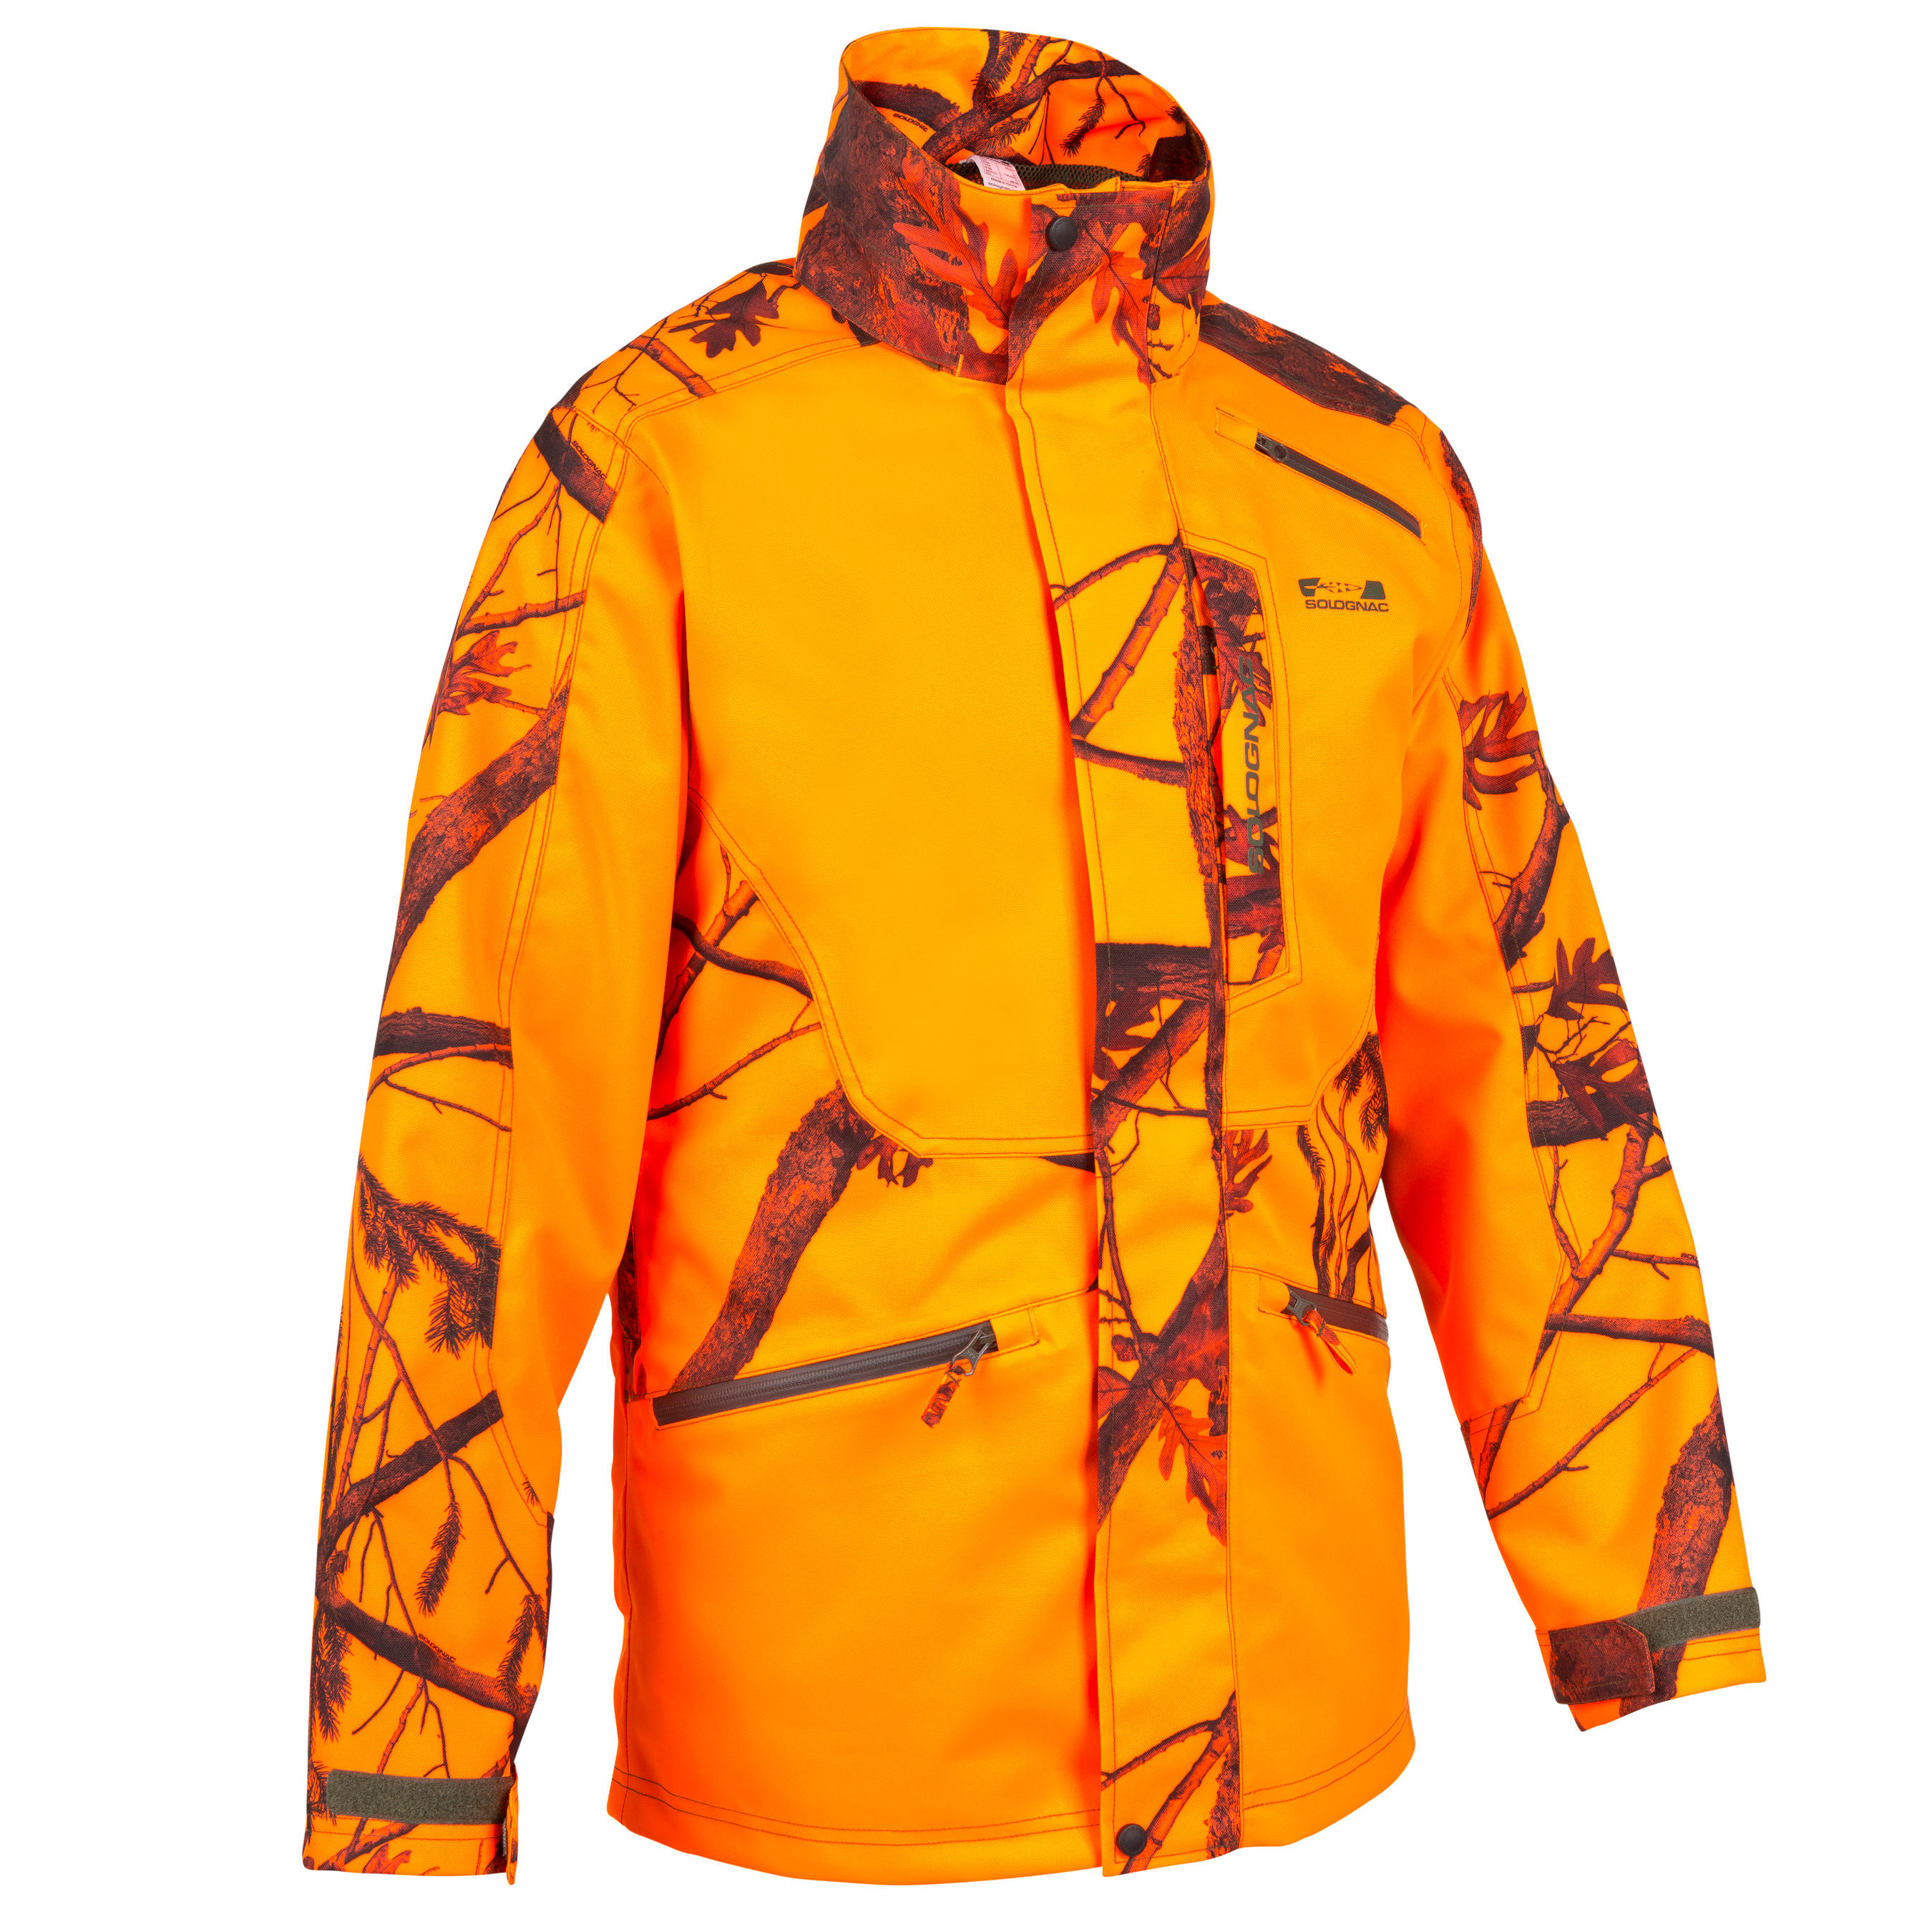 Jachetă SUPERTRACK imagine